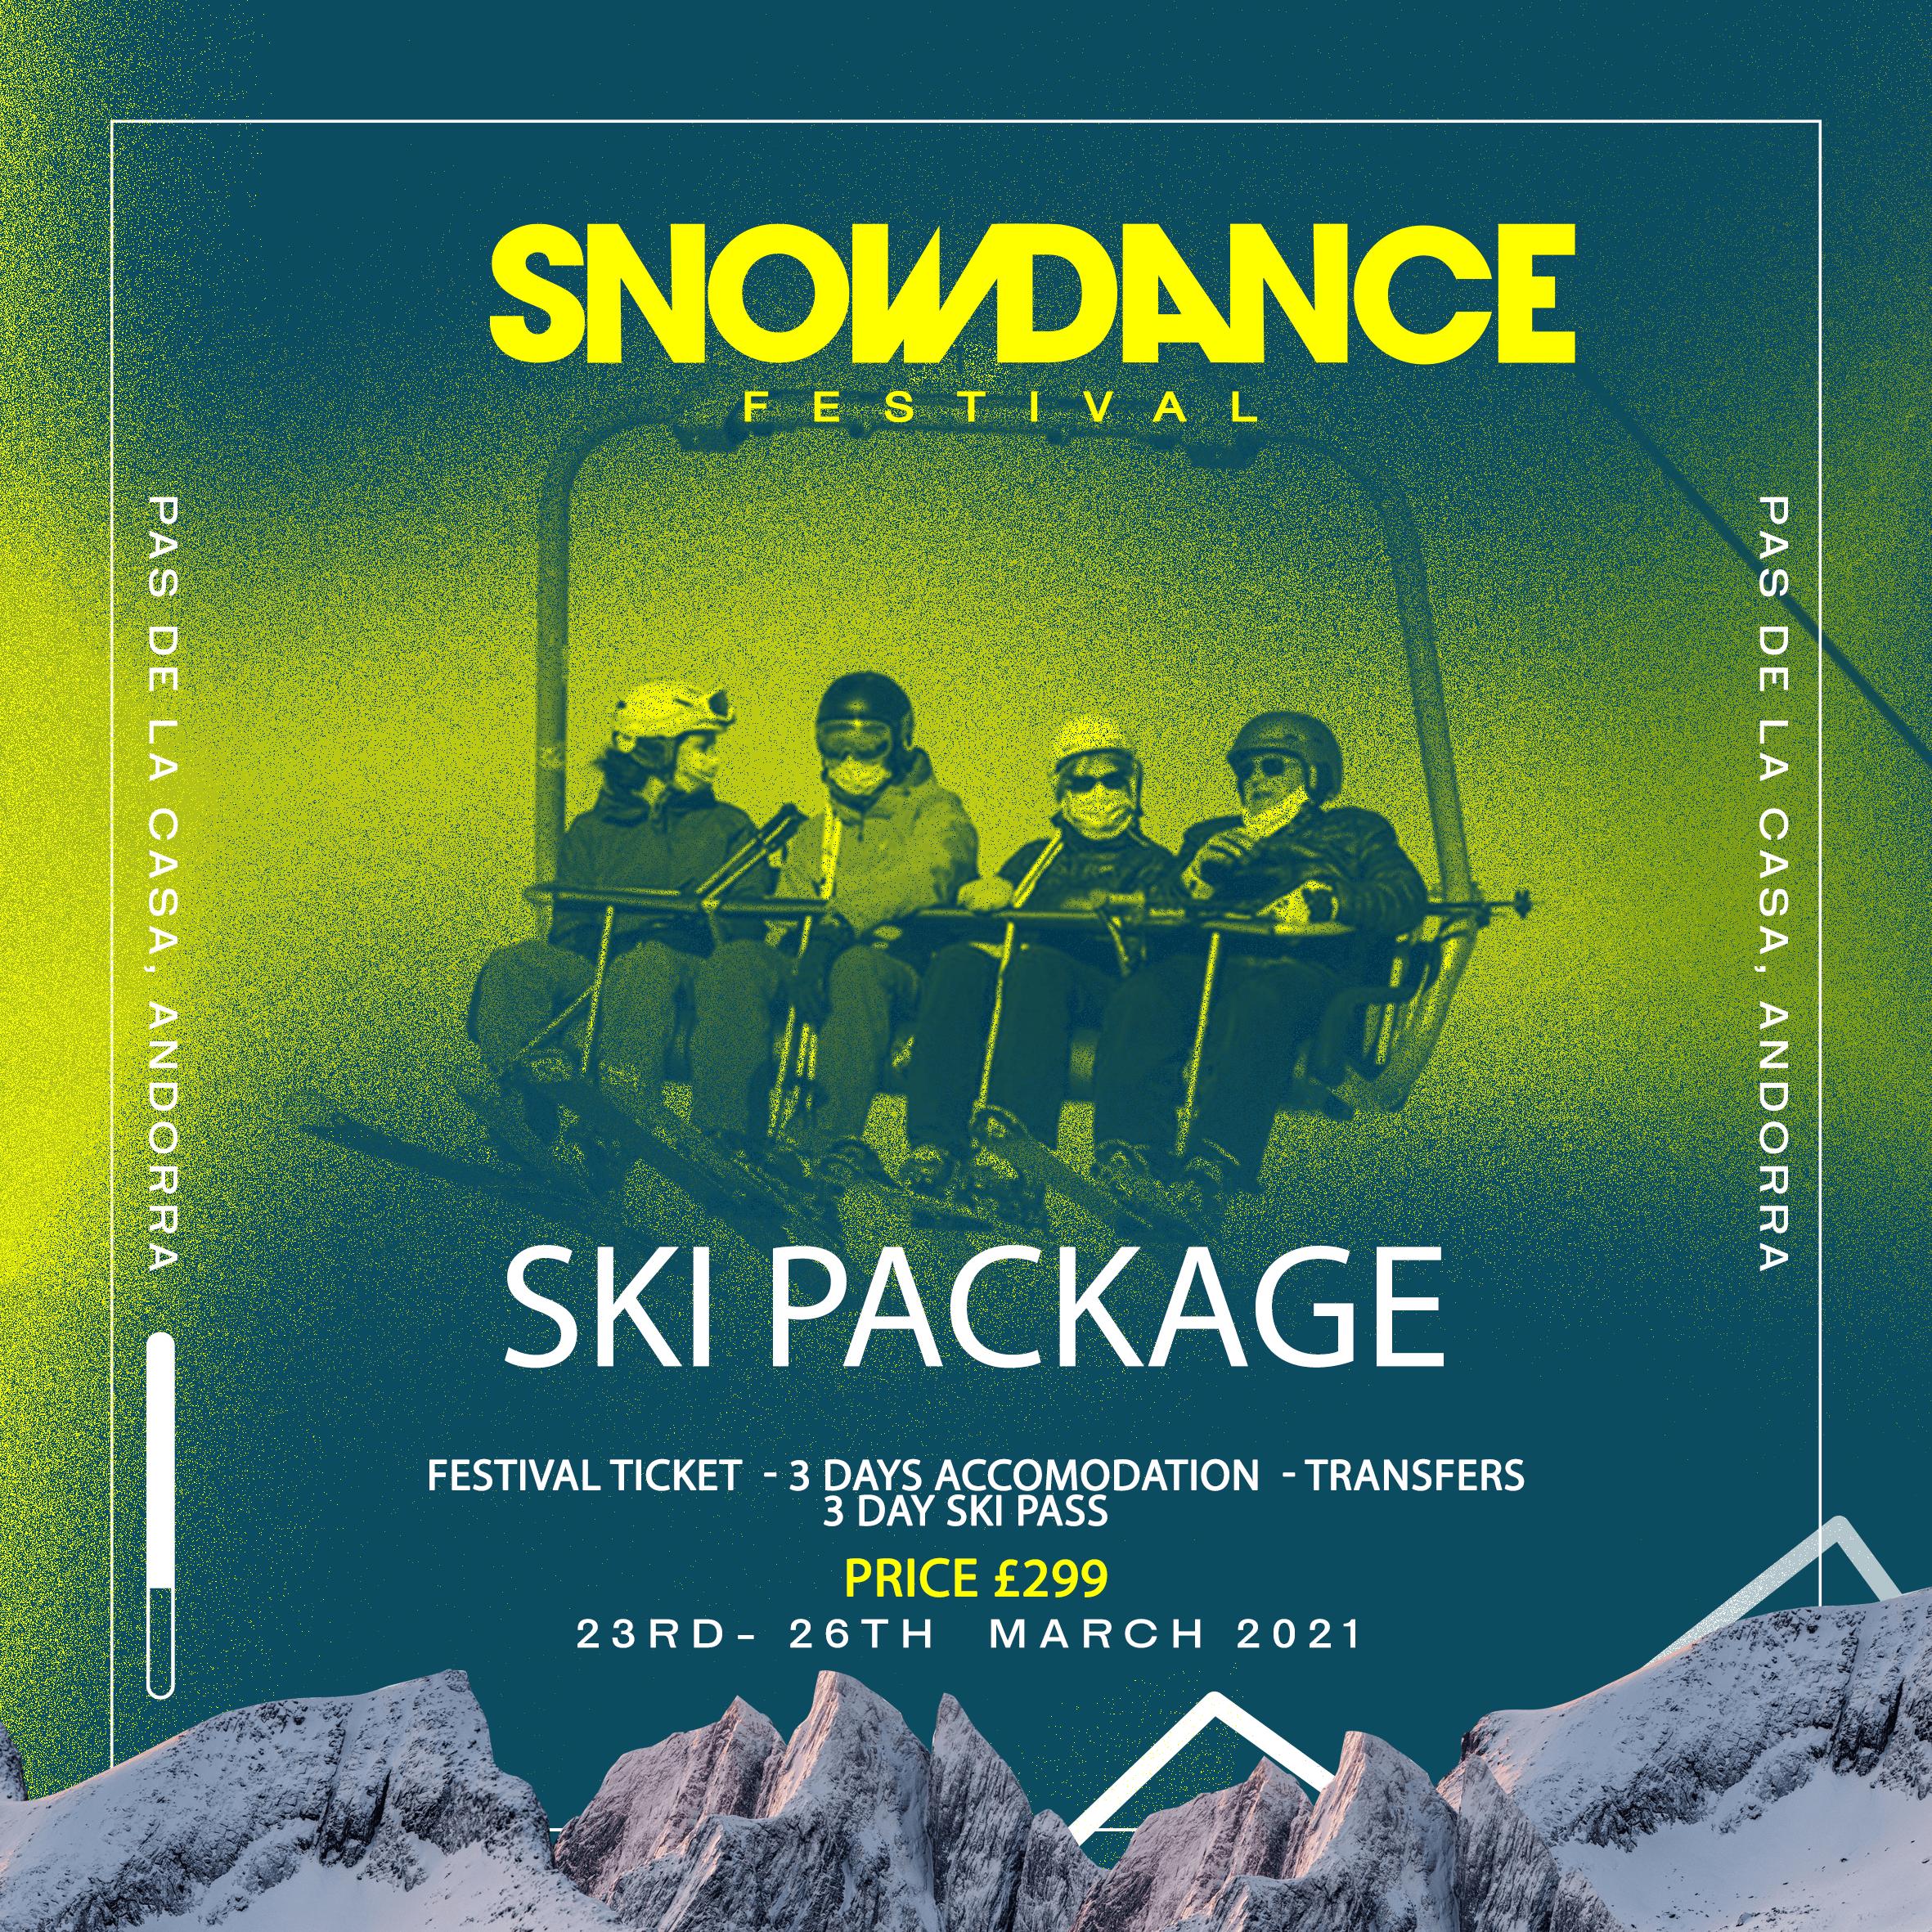 Ski Package new